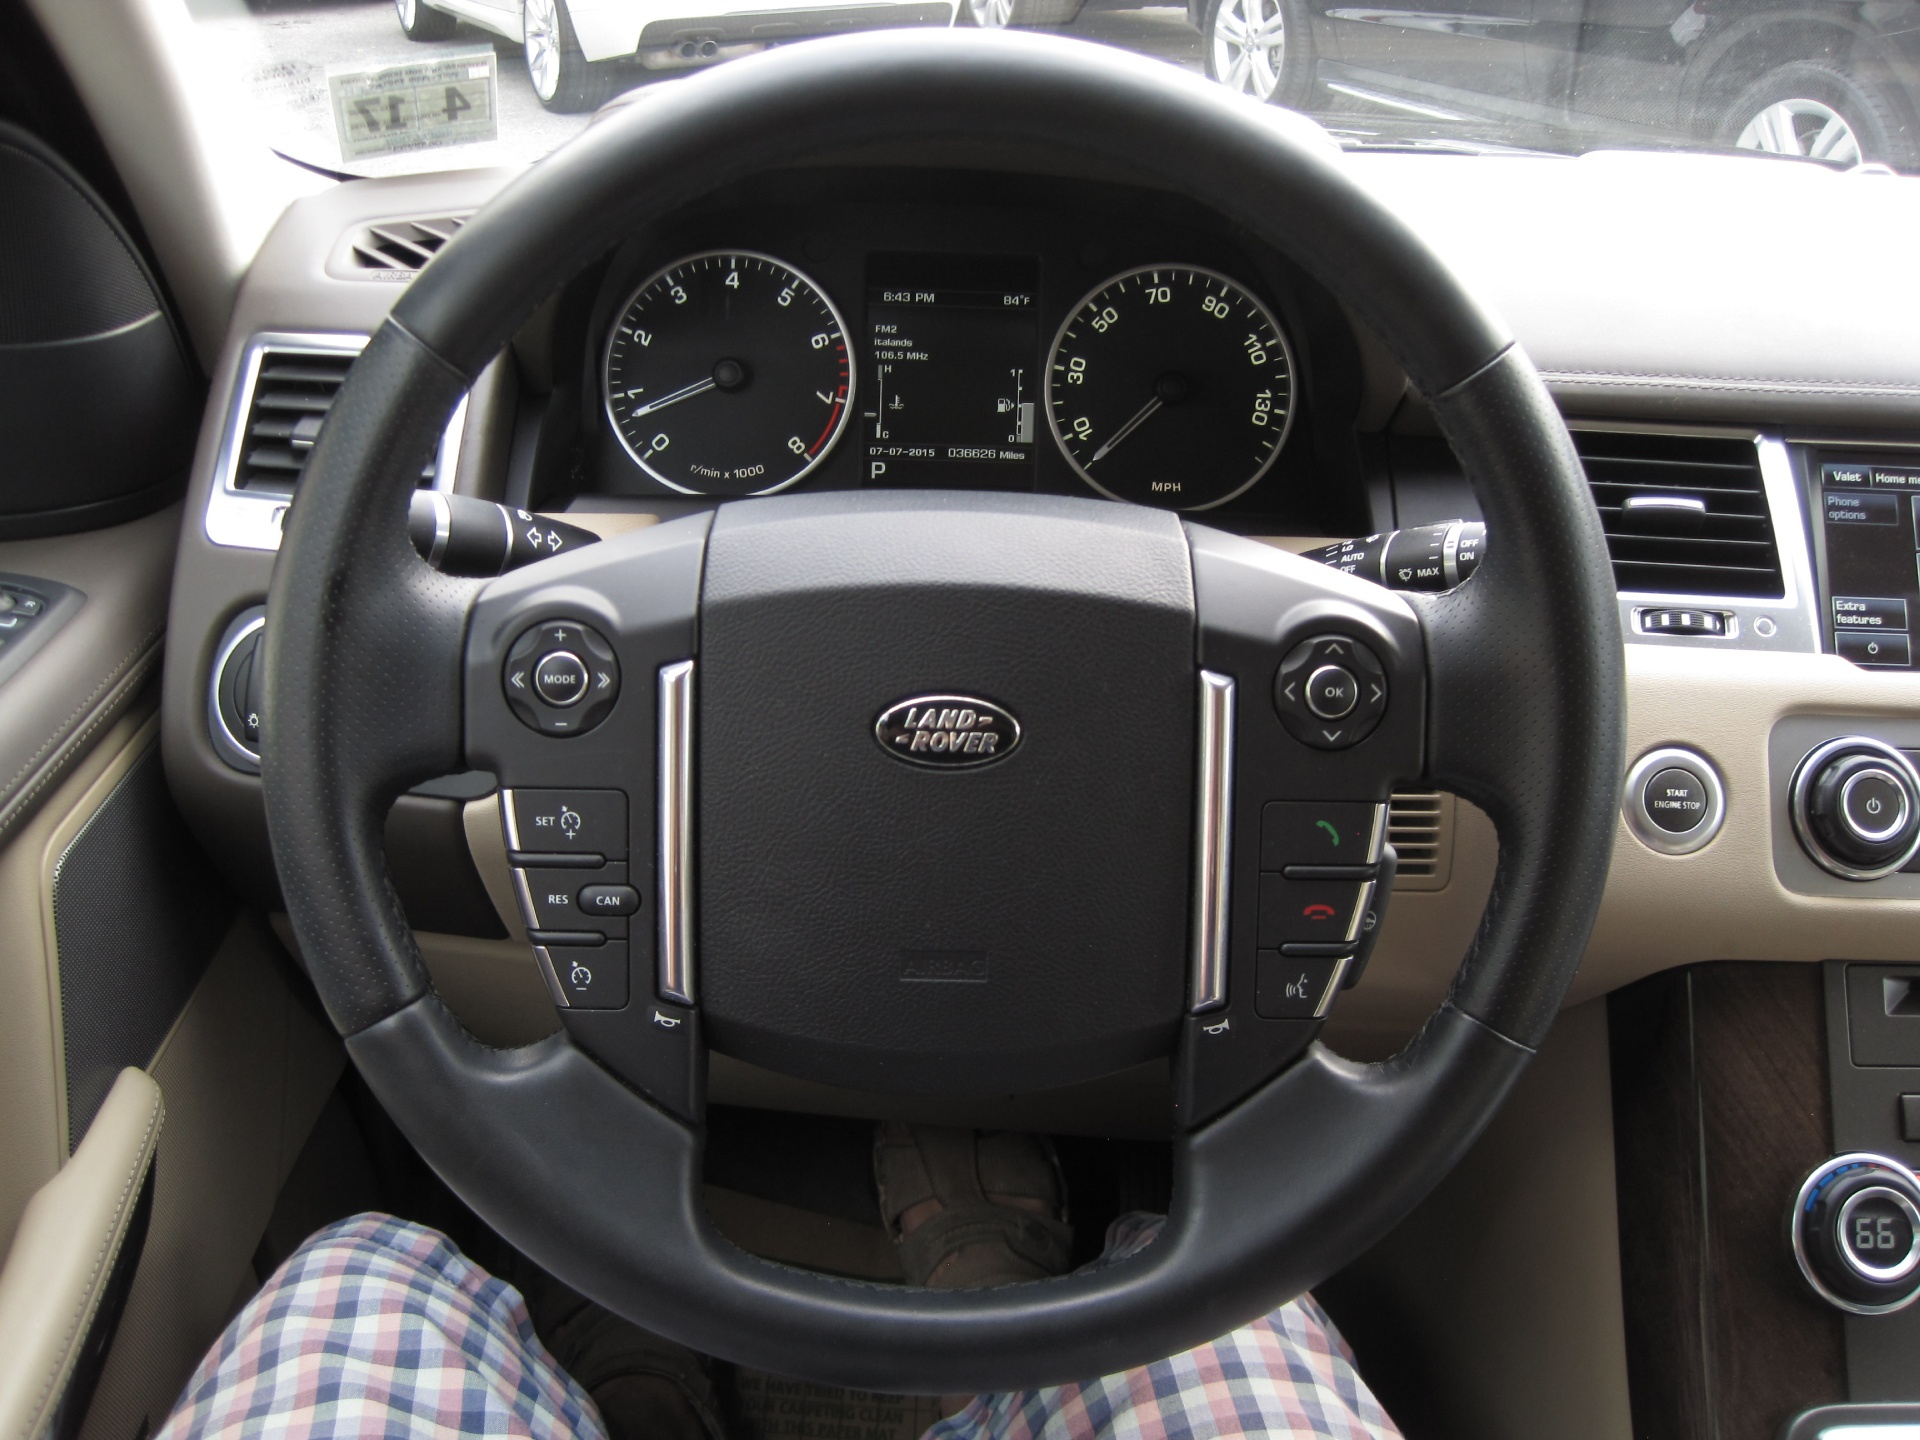 2012 Land Rover Range Rover Sport HSE LUX SANTORINI BLACK LUXURY